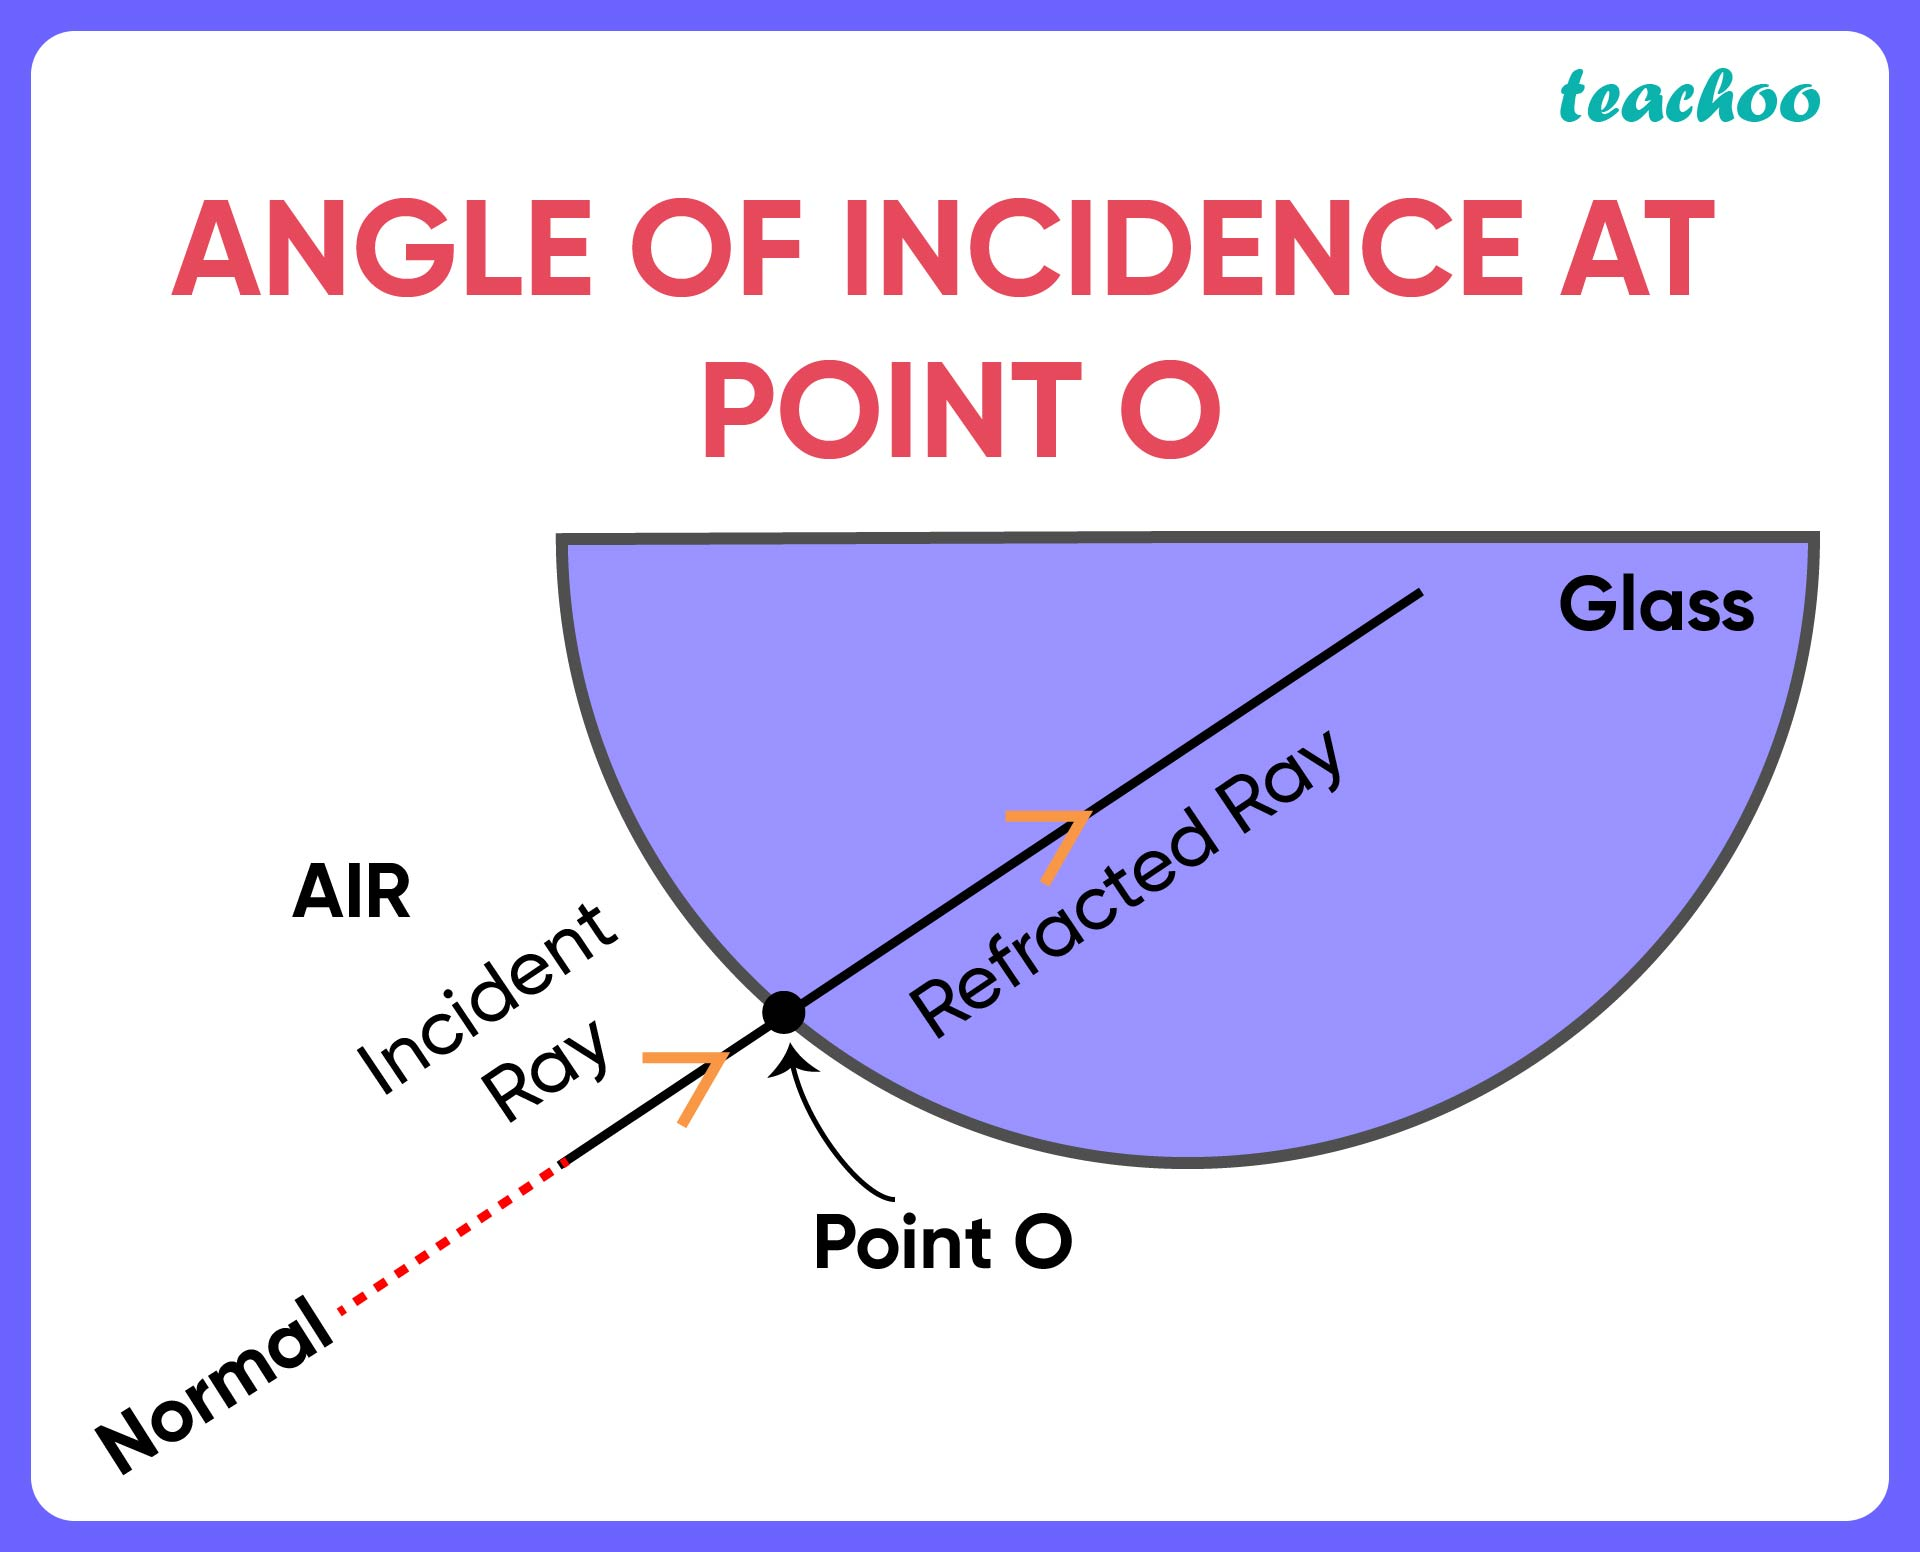 Angle of incidence at Point O-01.jpg